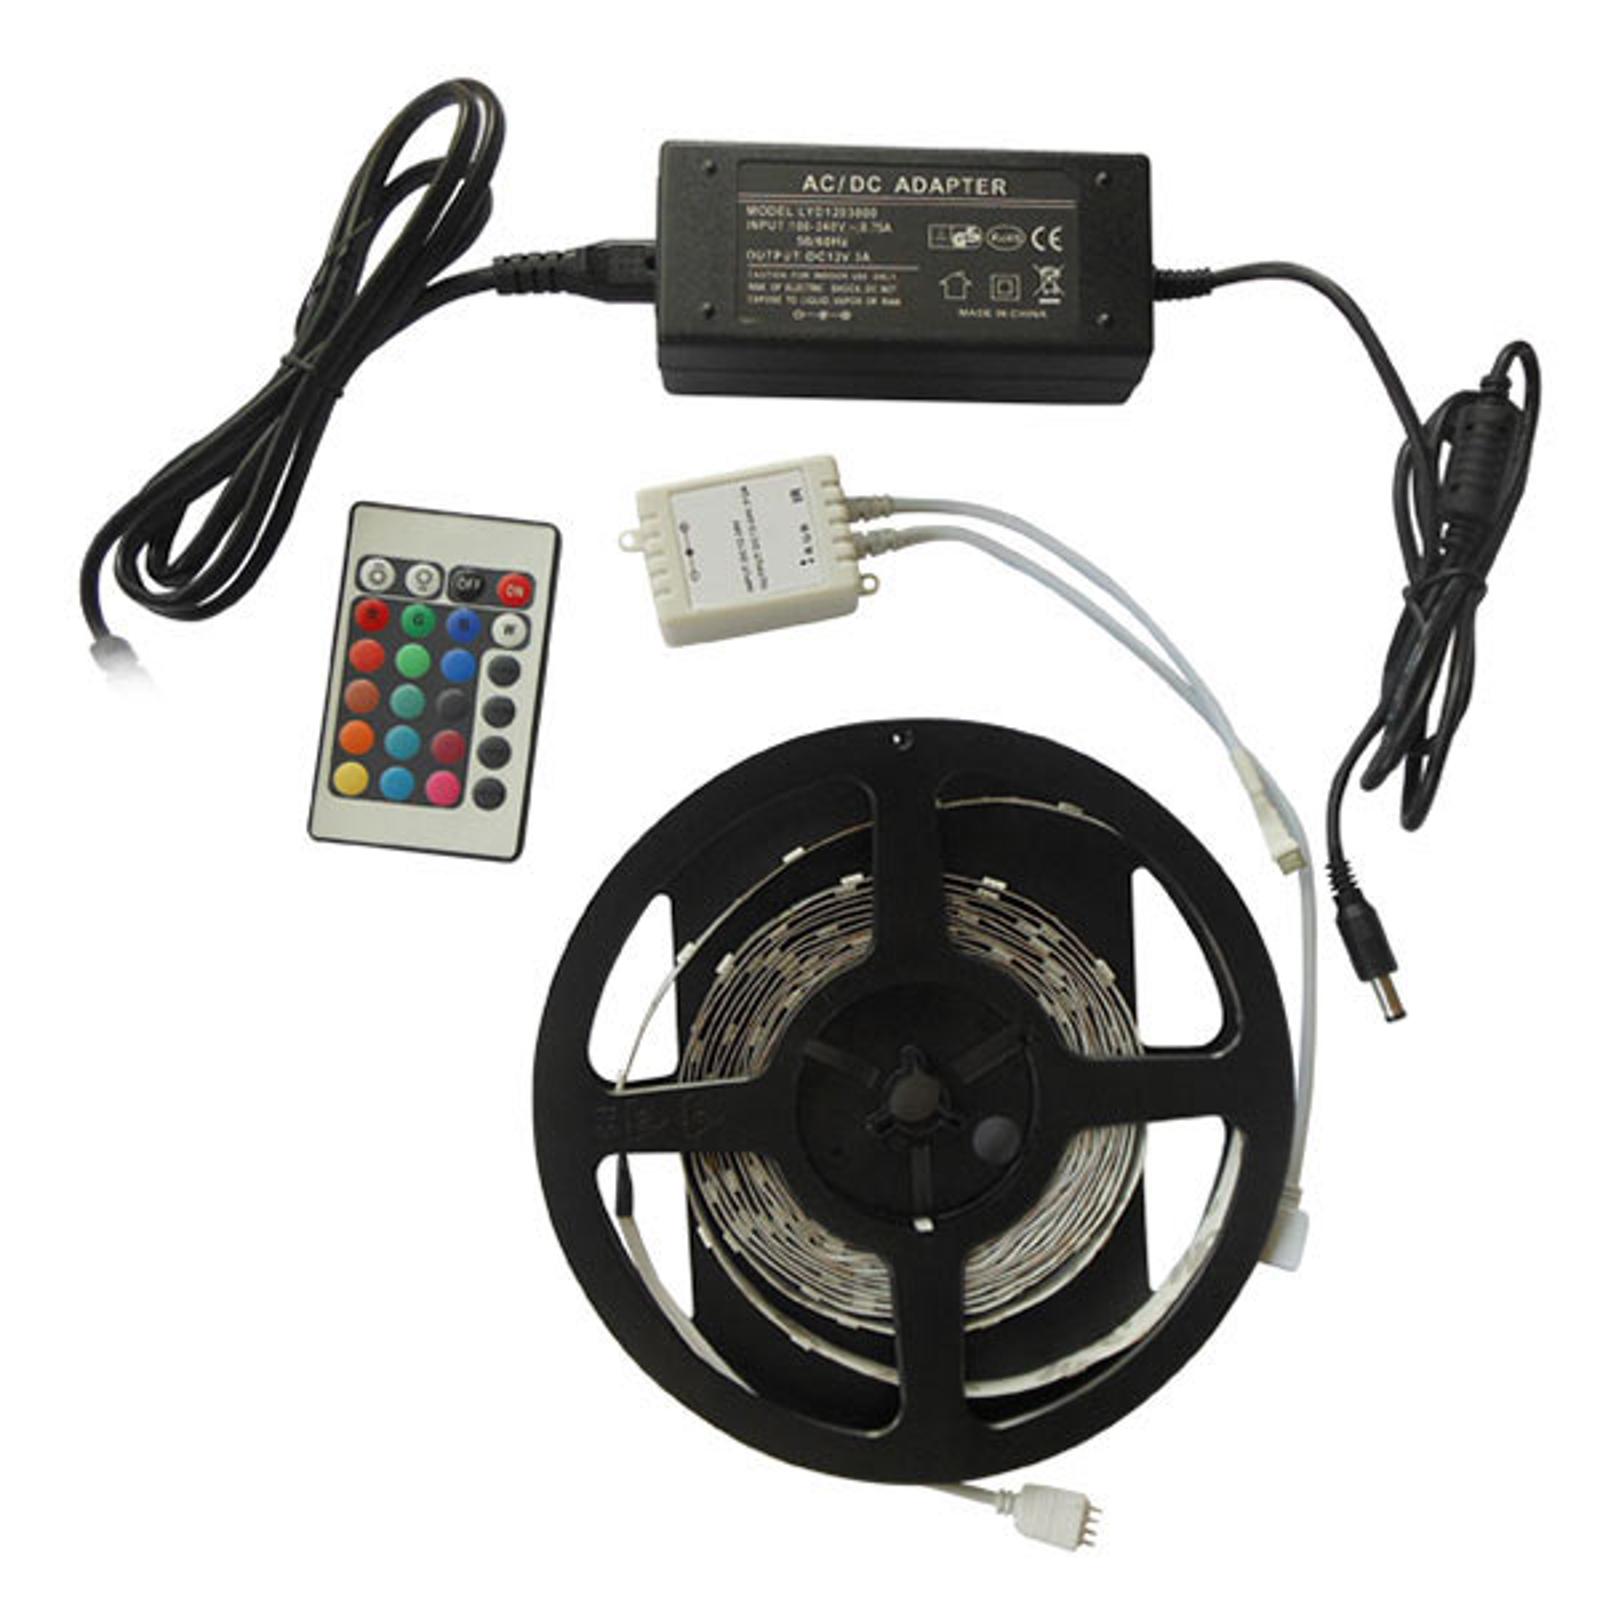 Strip LED SMD-RGBW-183 5 metri, impermeabile